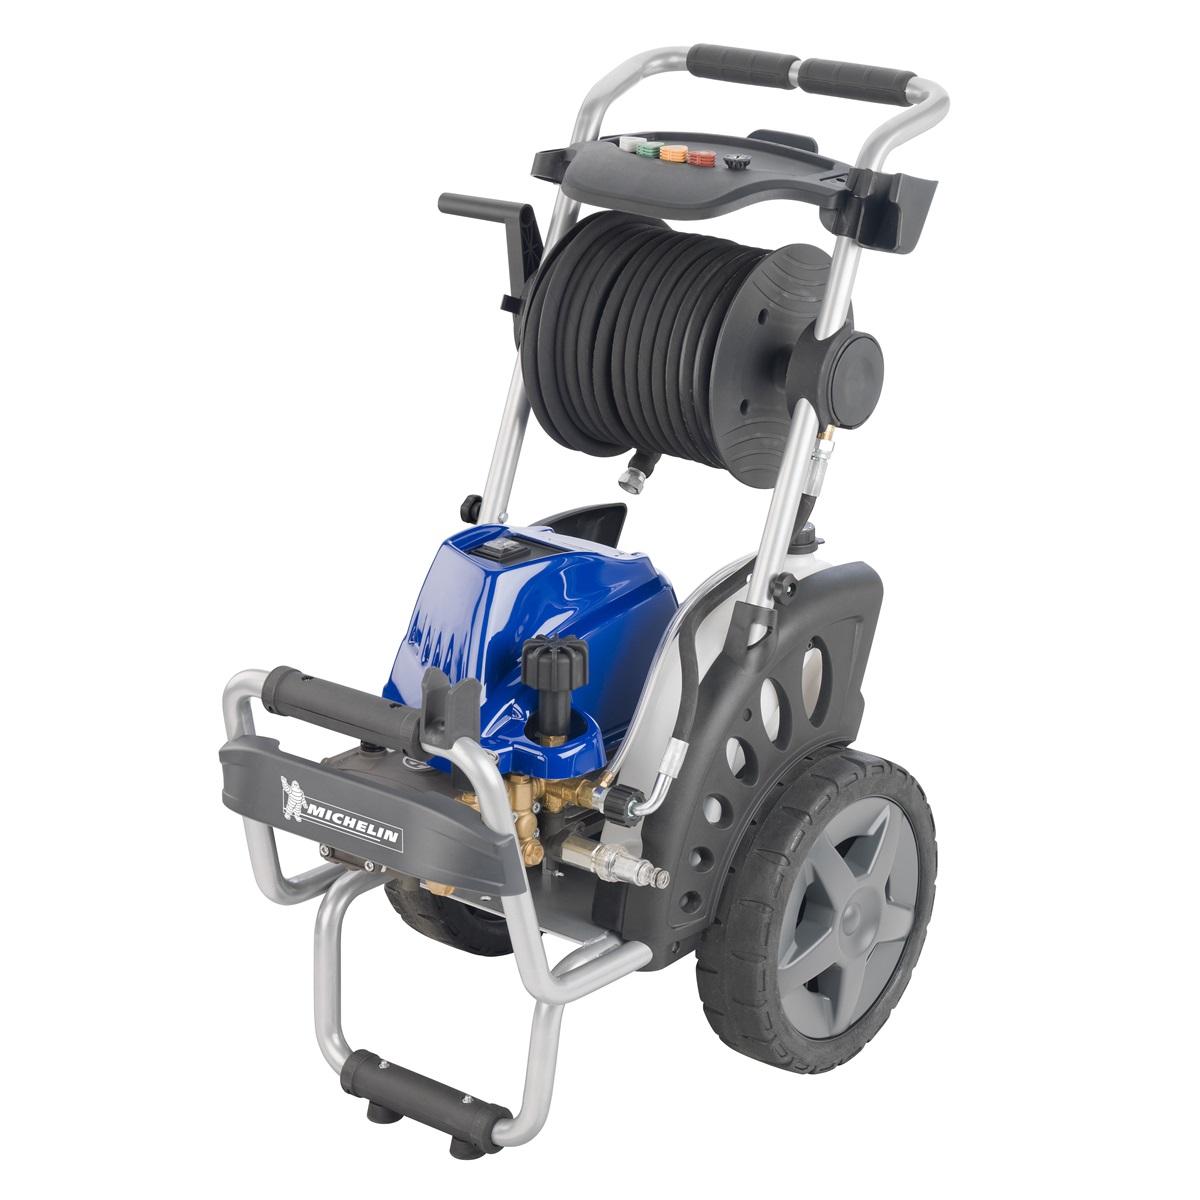 elektrický vysokotlakový čistič Michelin MPX 150 HDC (RLW)